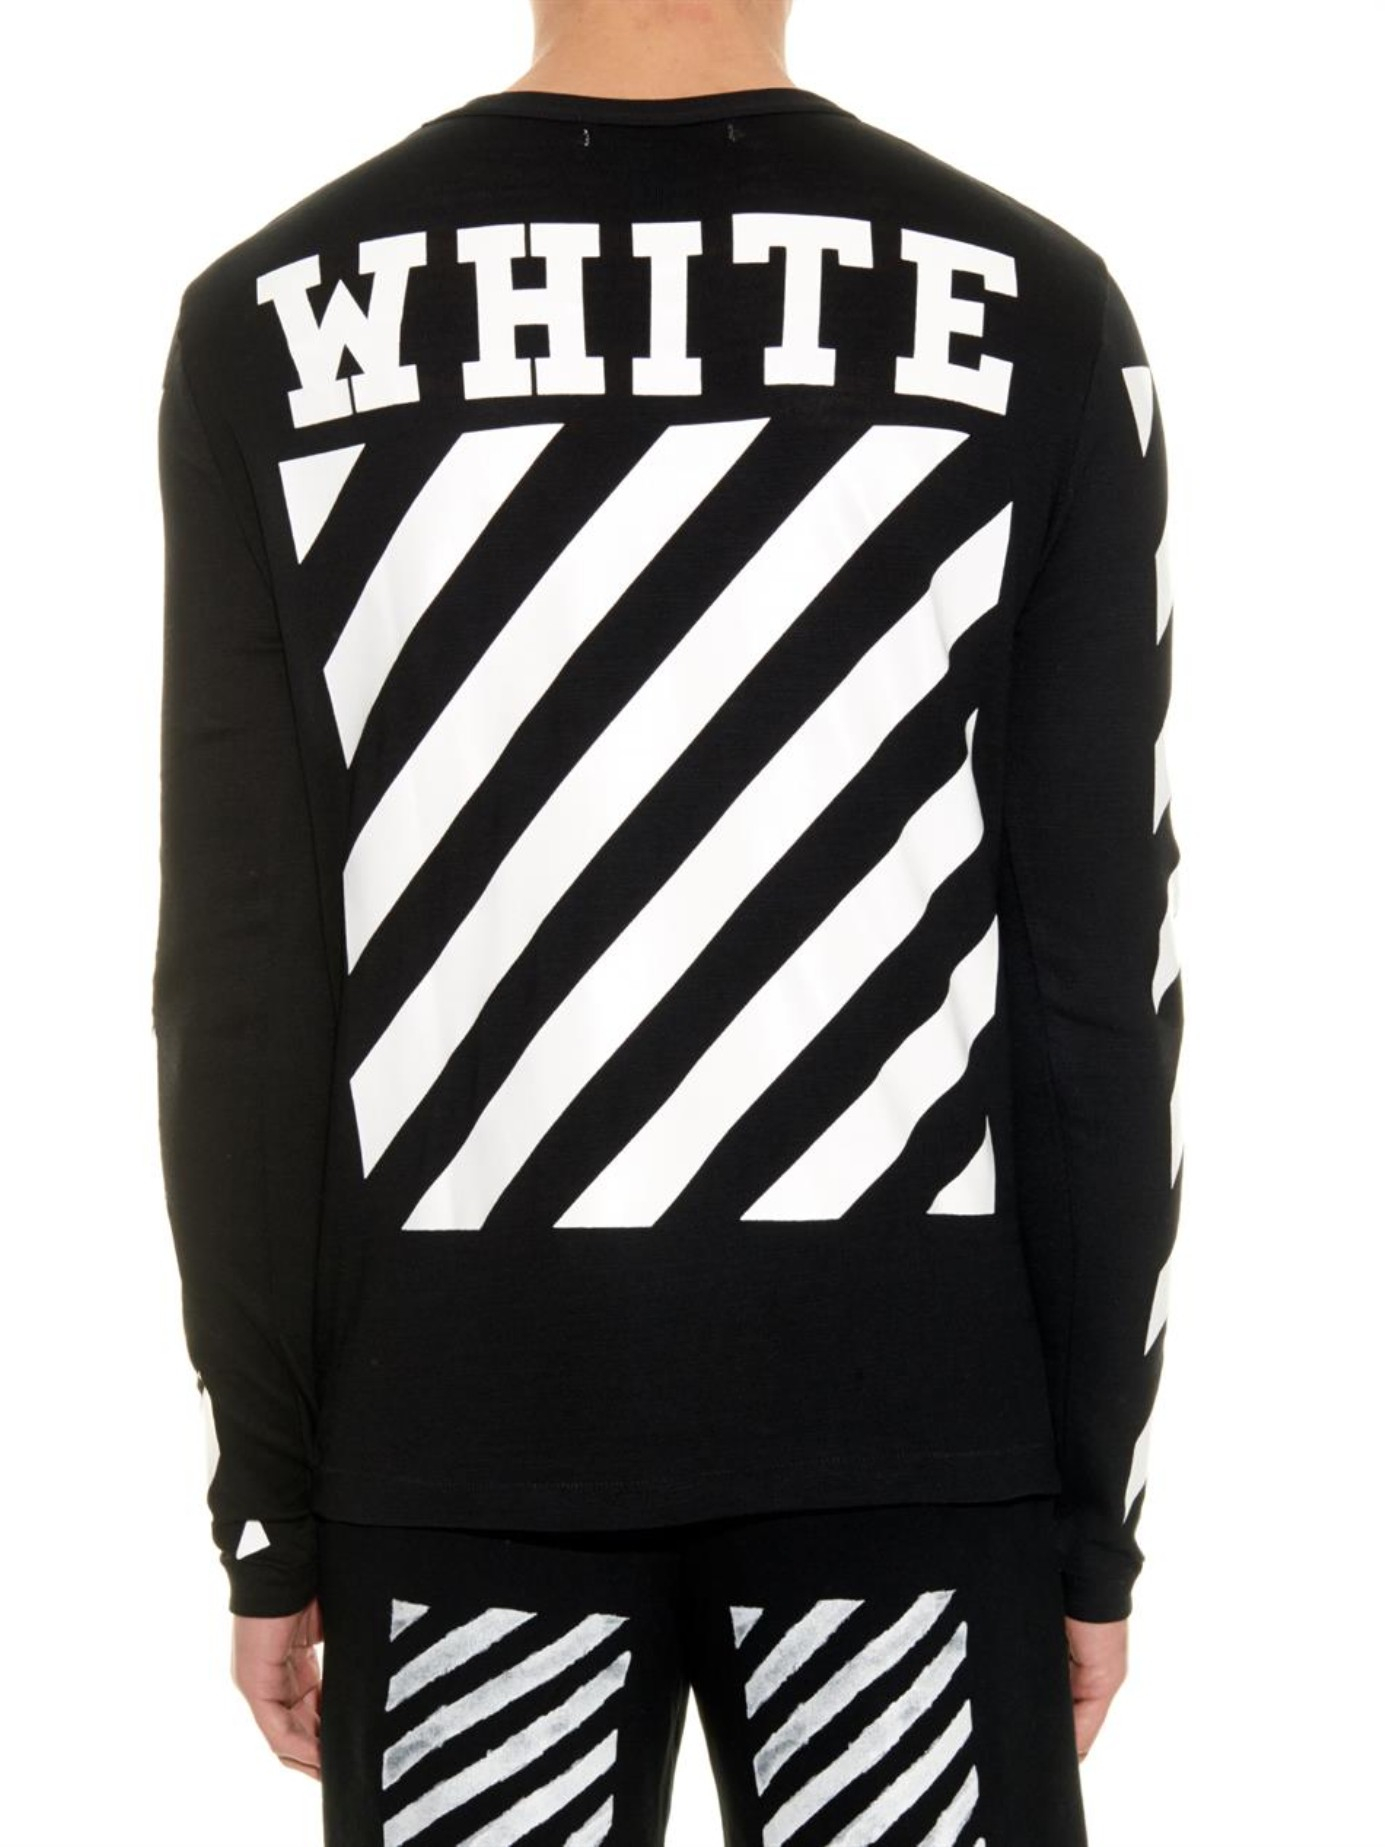 Target / Women / black stripe shirt Women's Plus Size Striped Crew Neck Long Sleeve T-Shirt - Ava & Viv™ Black/White. Ava & Viv™ 5 out of 5 stars with 3 reviews. 3. $ Save 20% with code SAVE Choose options. Women's Plus Size Striped Boatneck 3/4 Sleeve T-Shirt - Ava & Viv™ Black/White.